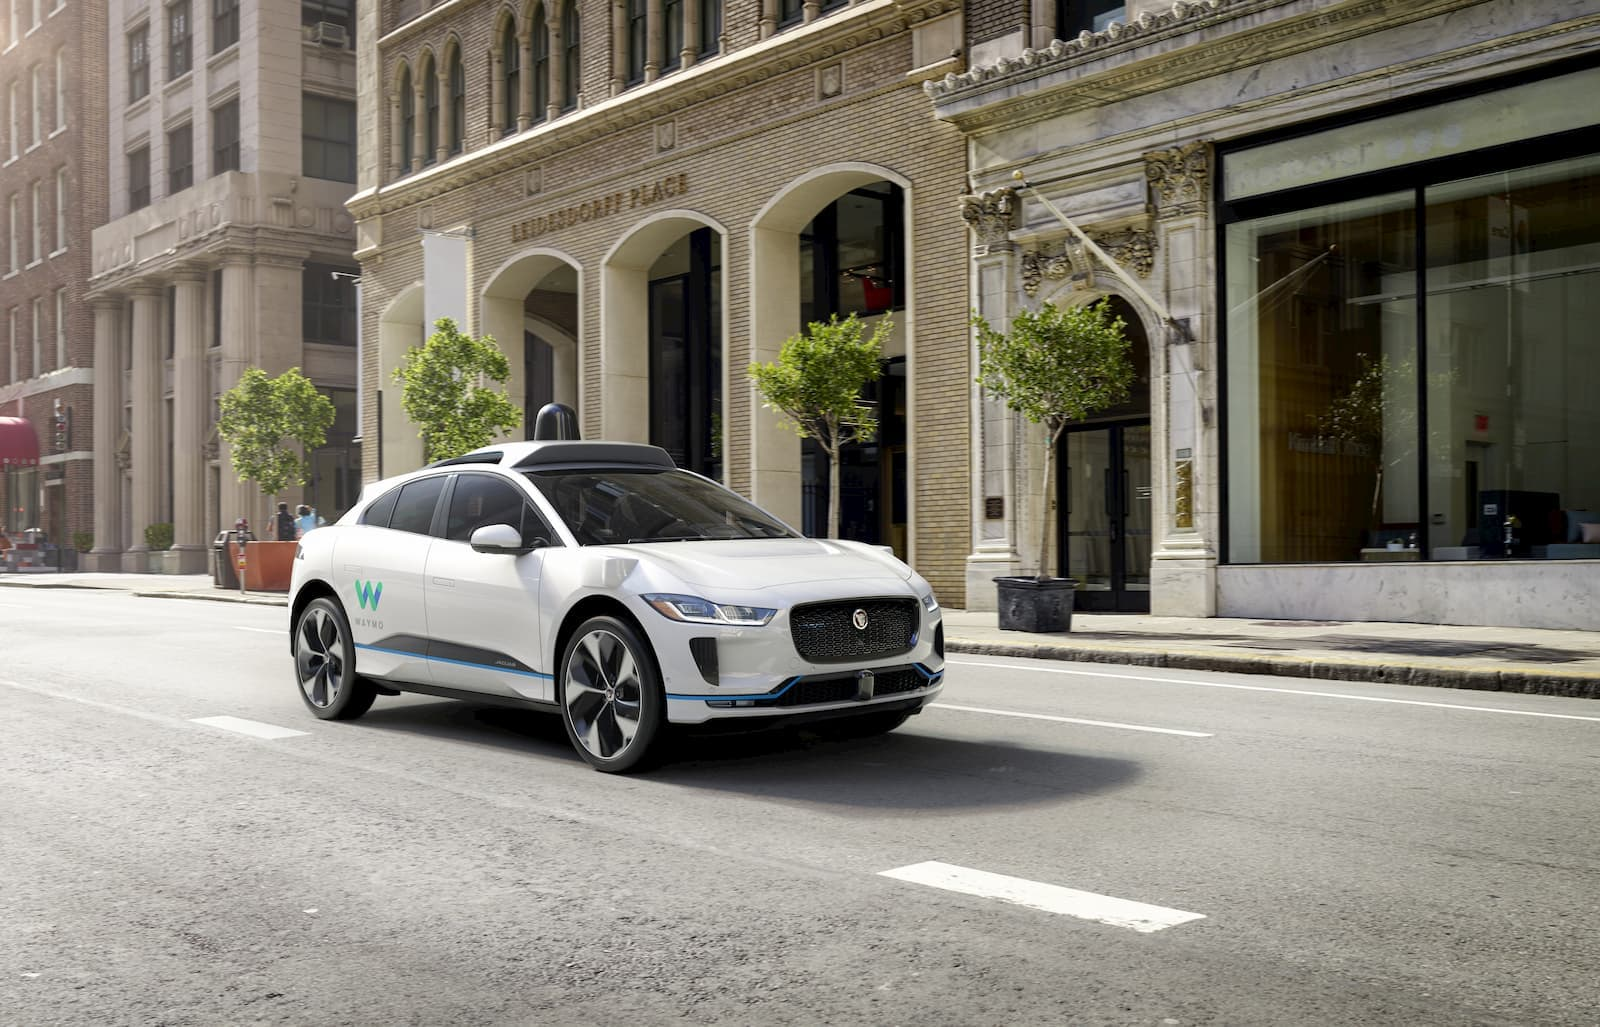 Waymo's Jaguar EV hits public roads for self-driving tests